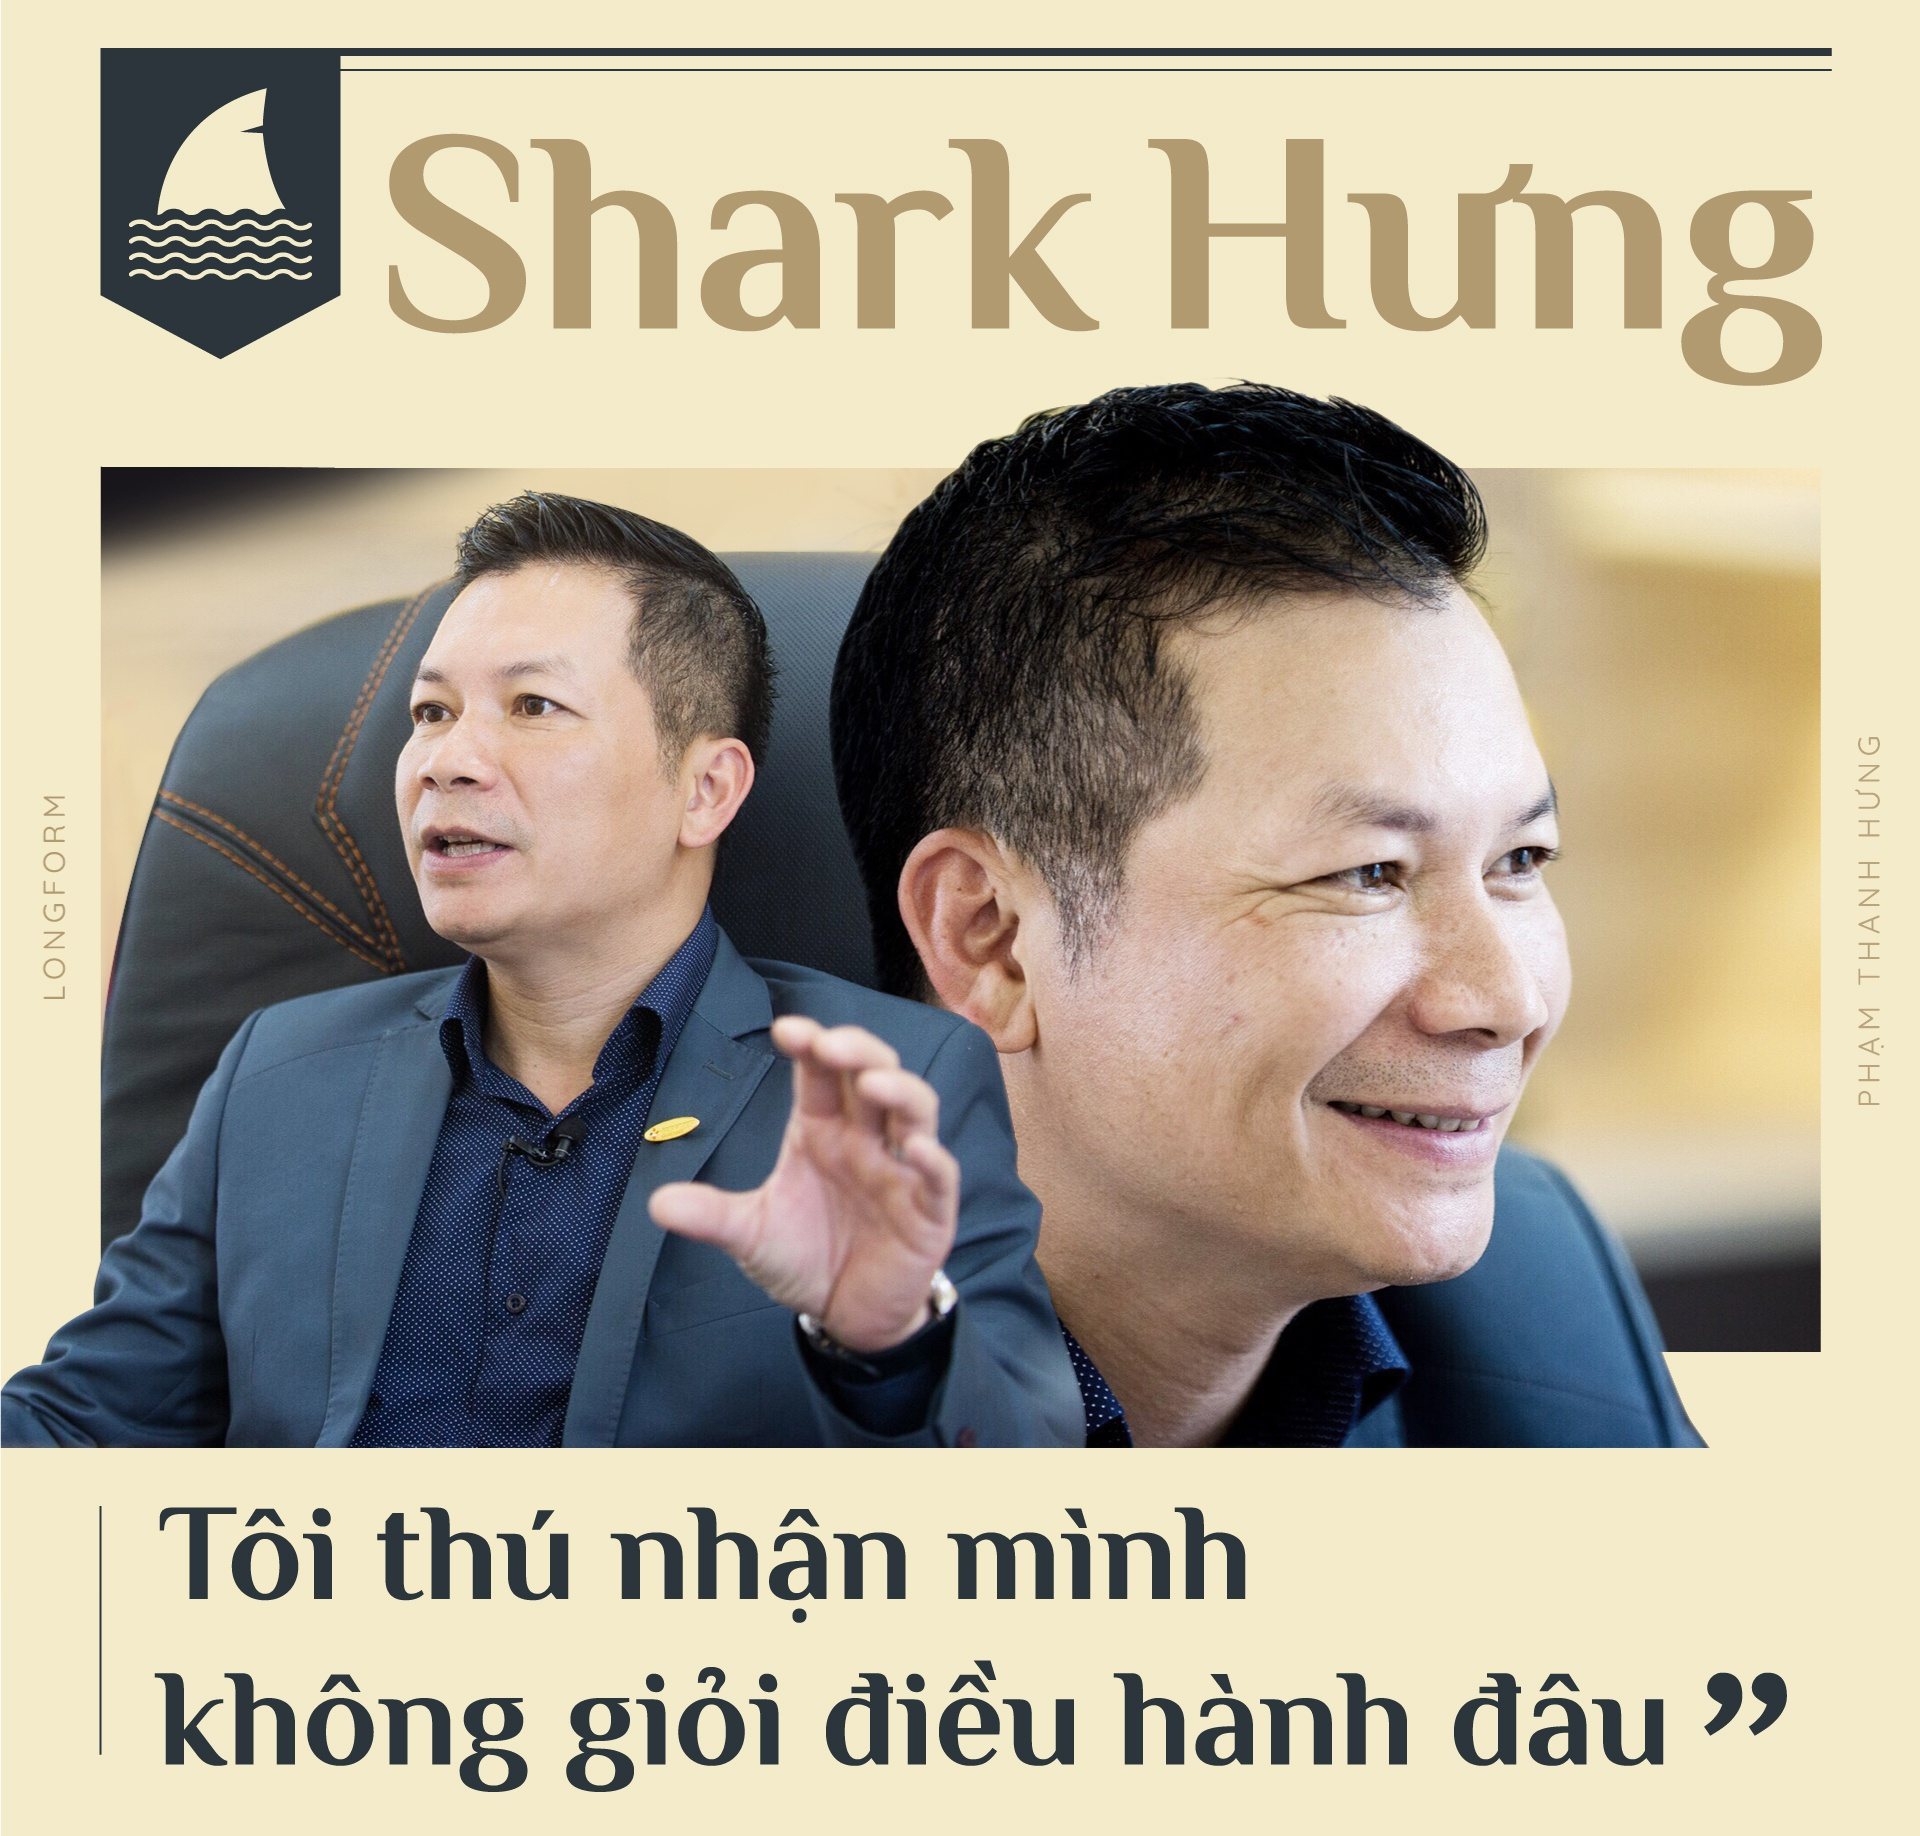 Shark Hung: 'Toi thu nhan khong gioi dieu hanh dau' hinh anh 1